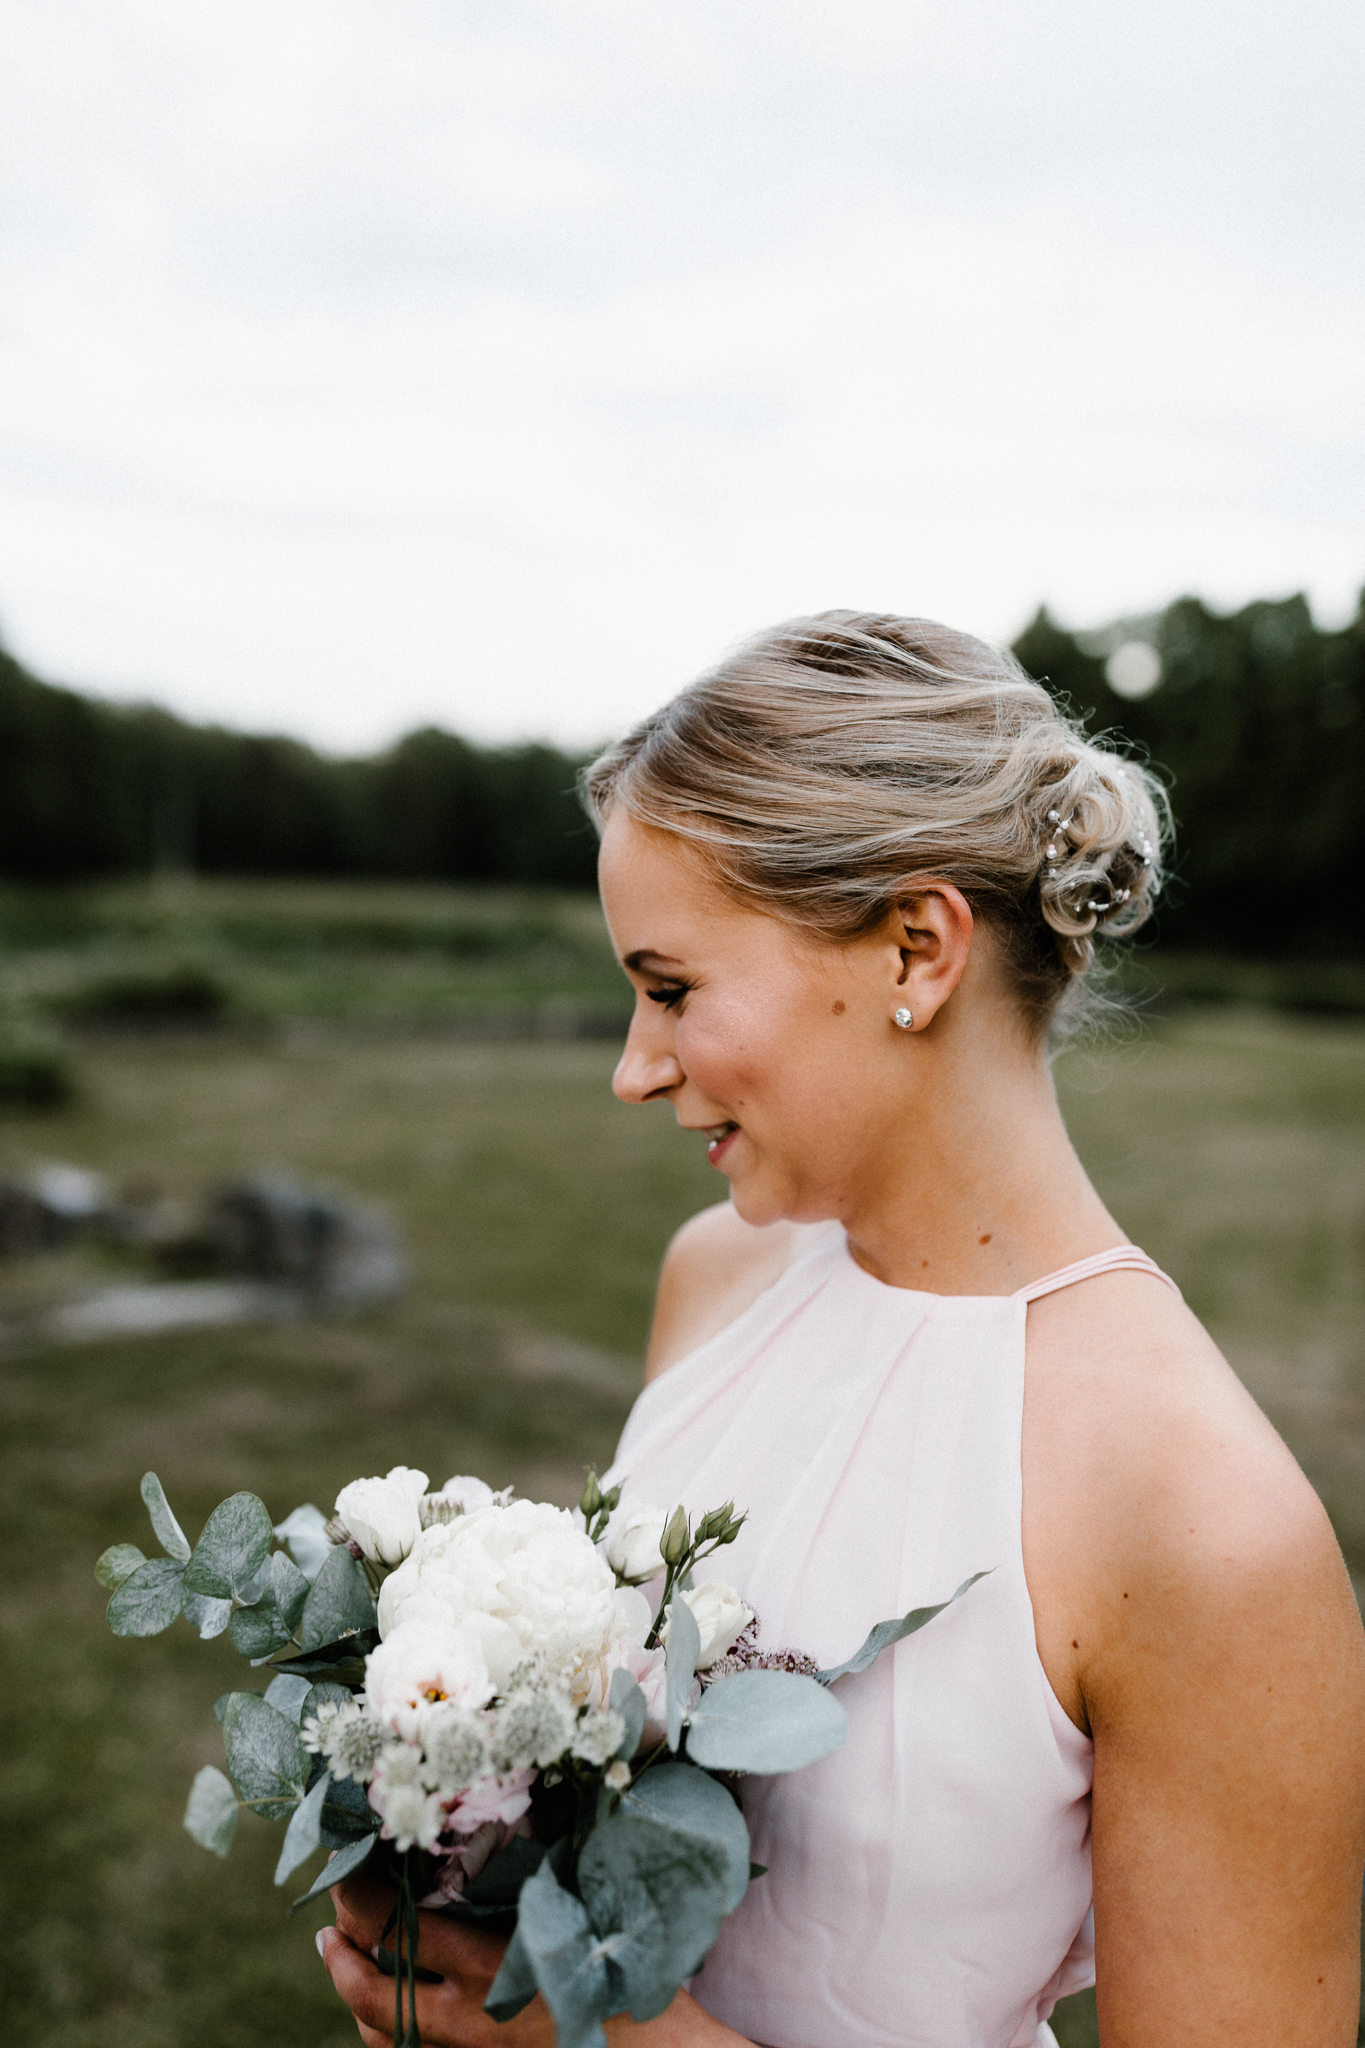 Essi + Ville   Oitbacka Gården   by Patrick Karkkolainen Wedding Photography-312.jpg